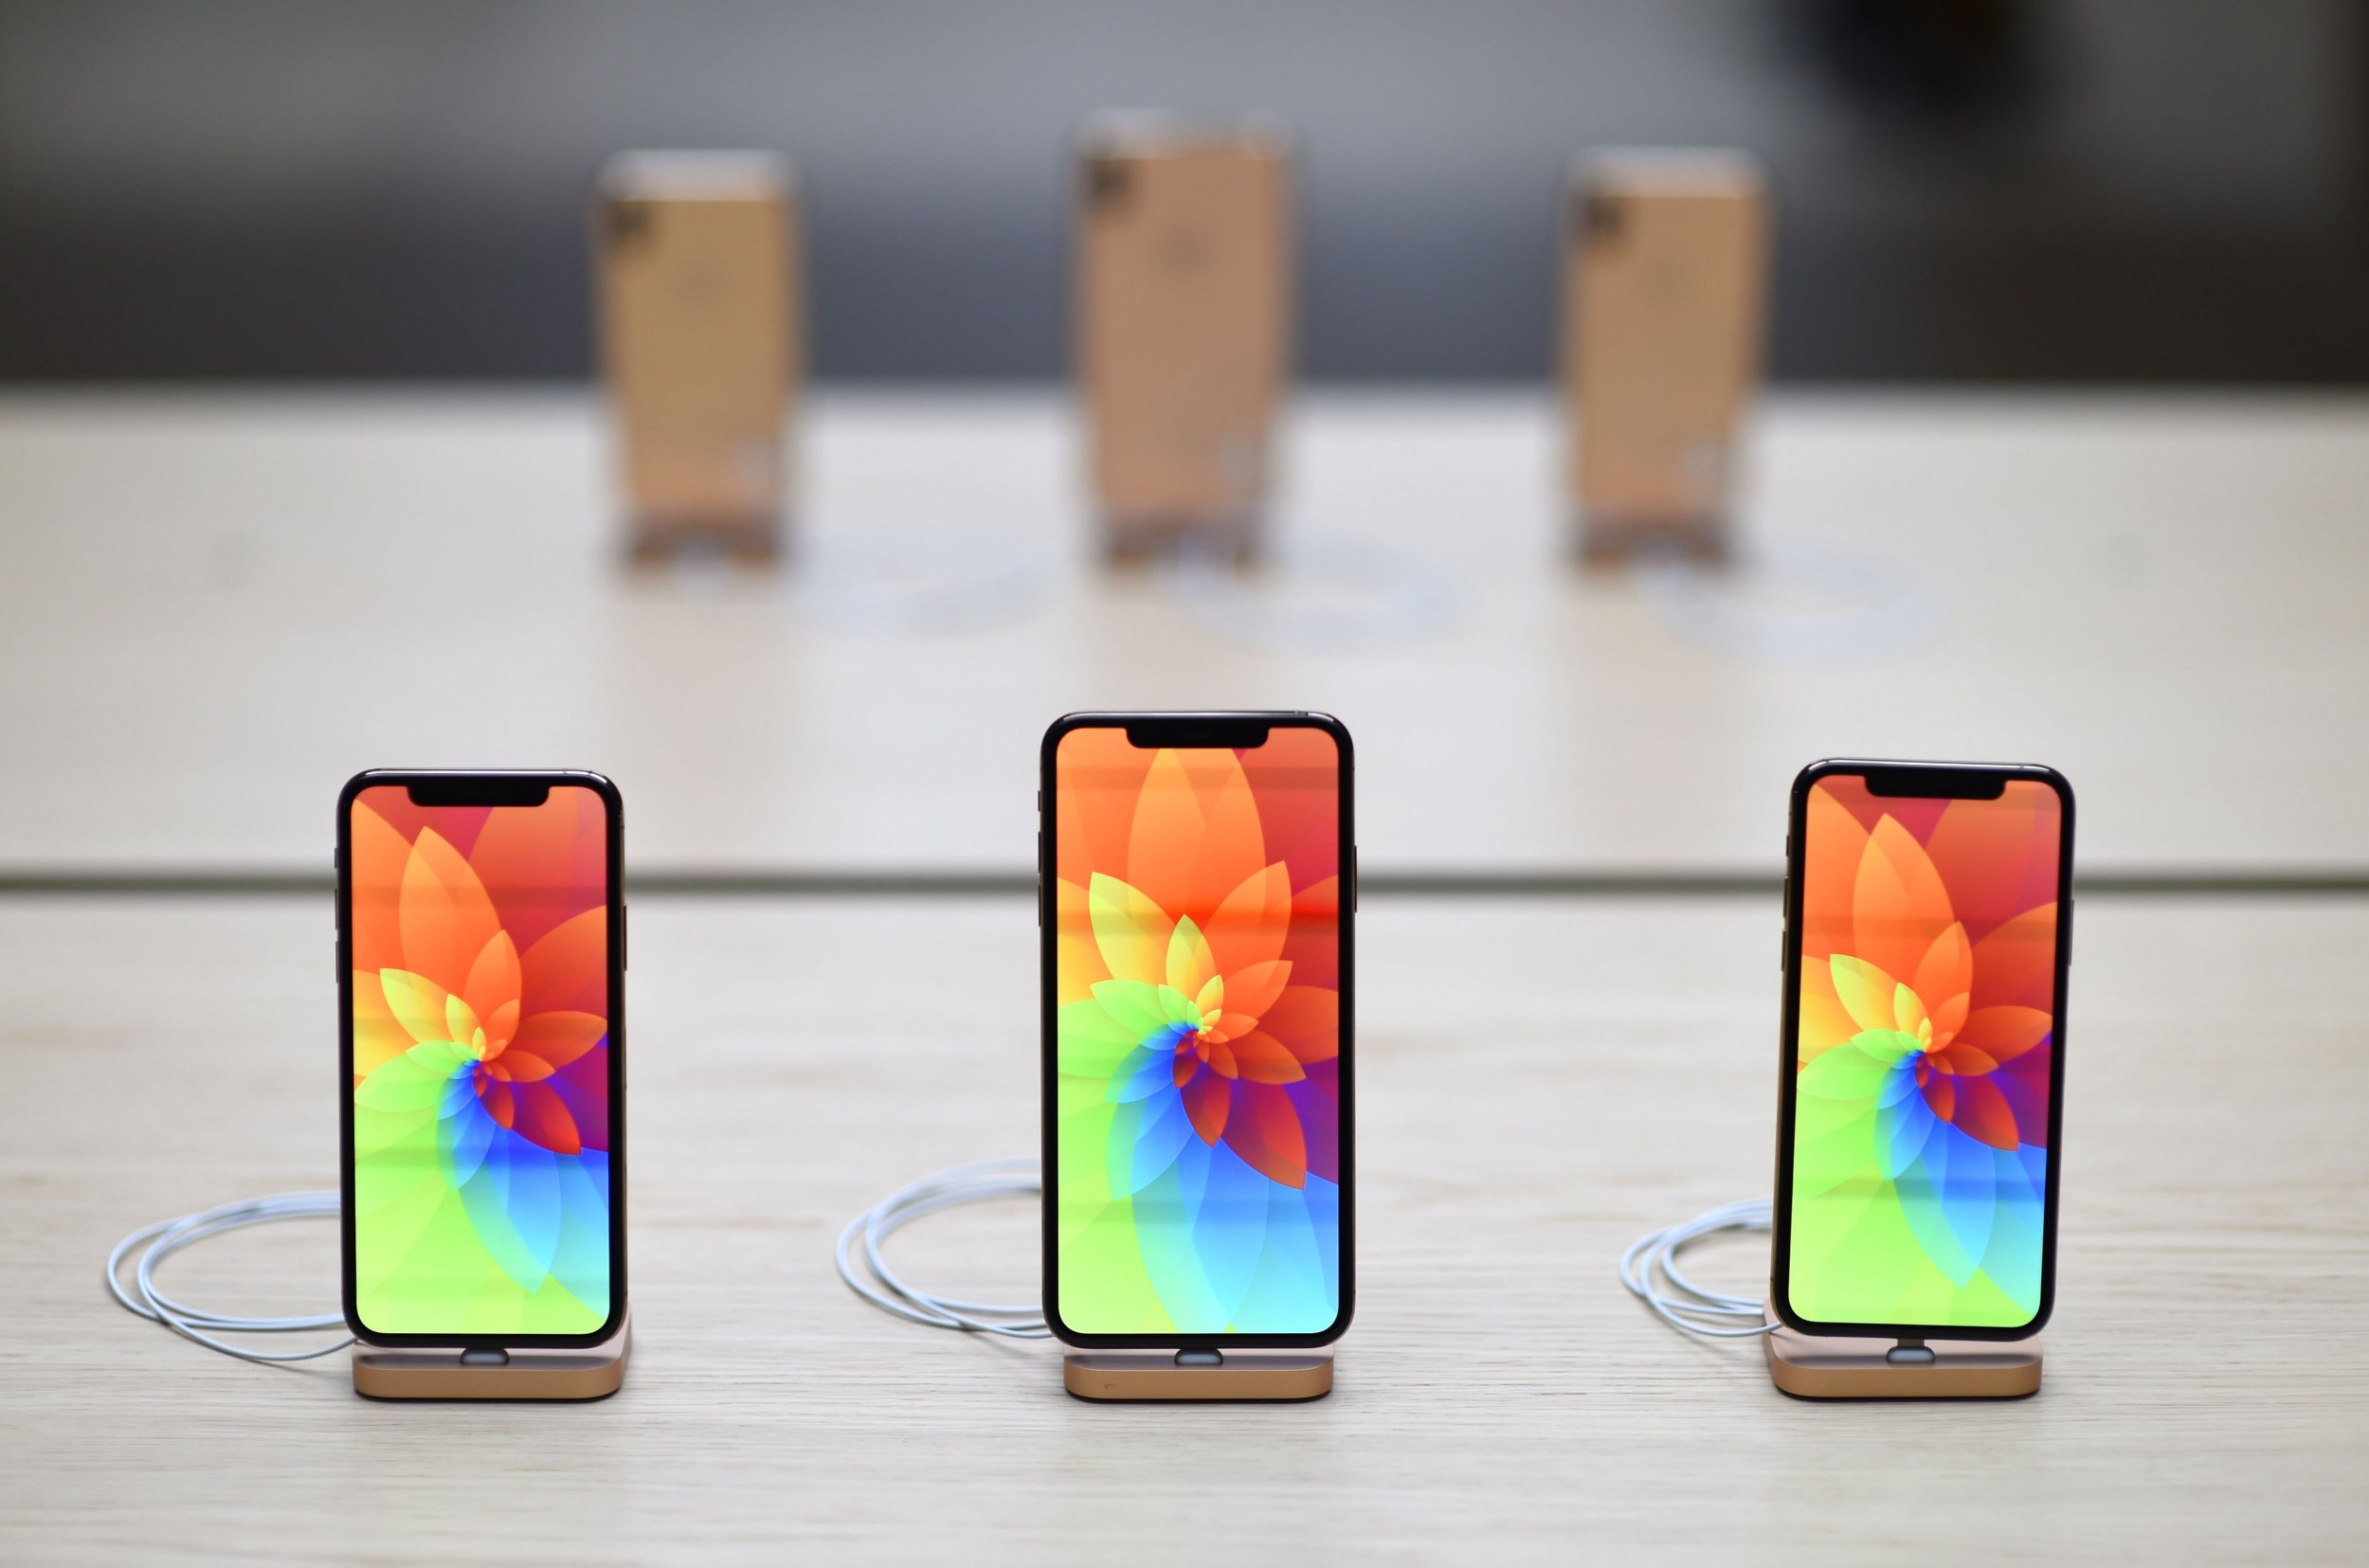 apple black friday cyber monday 2018 deals apple watch iphone xs macbooks ipads sales. Black Bedroom Furniture Sets. Home Design Ideas